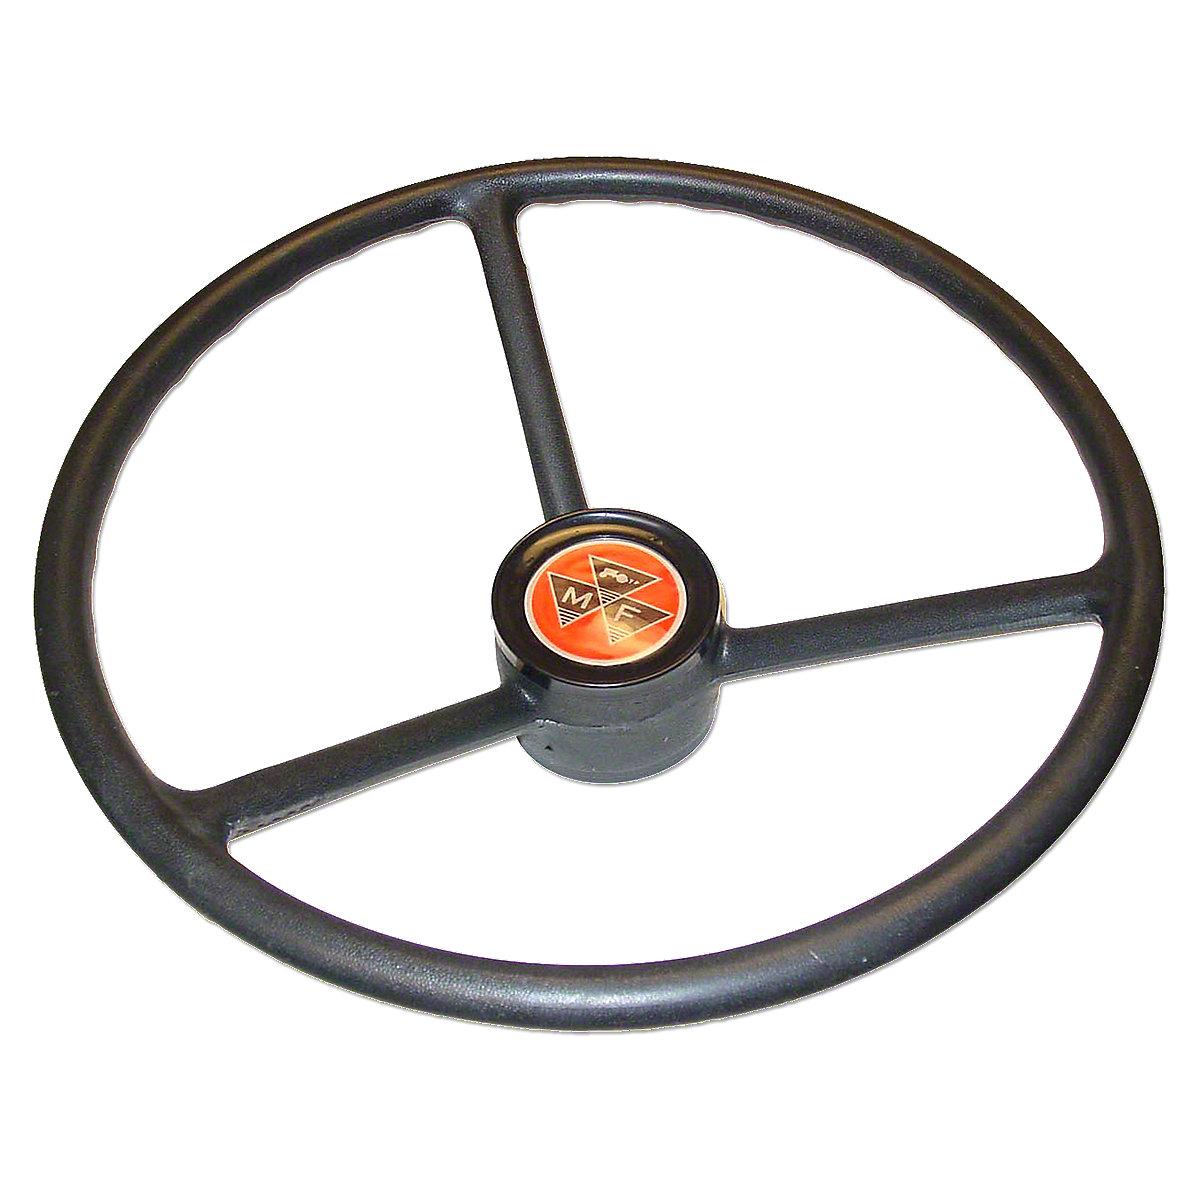 Massey Ferguson 175 Steering Parts : Mfs steering wheel with plastic center cap for massey